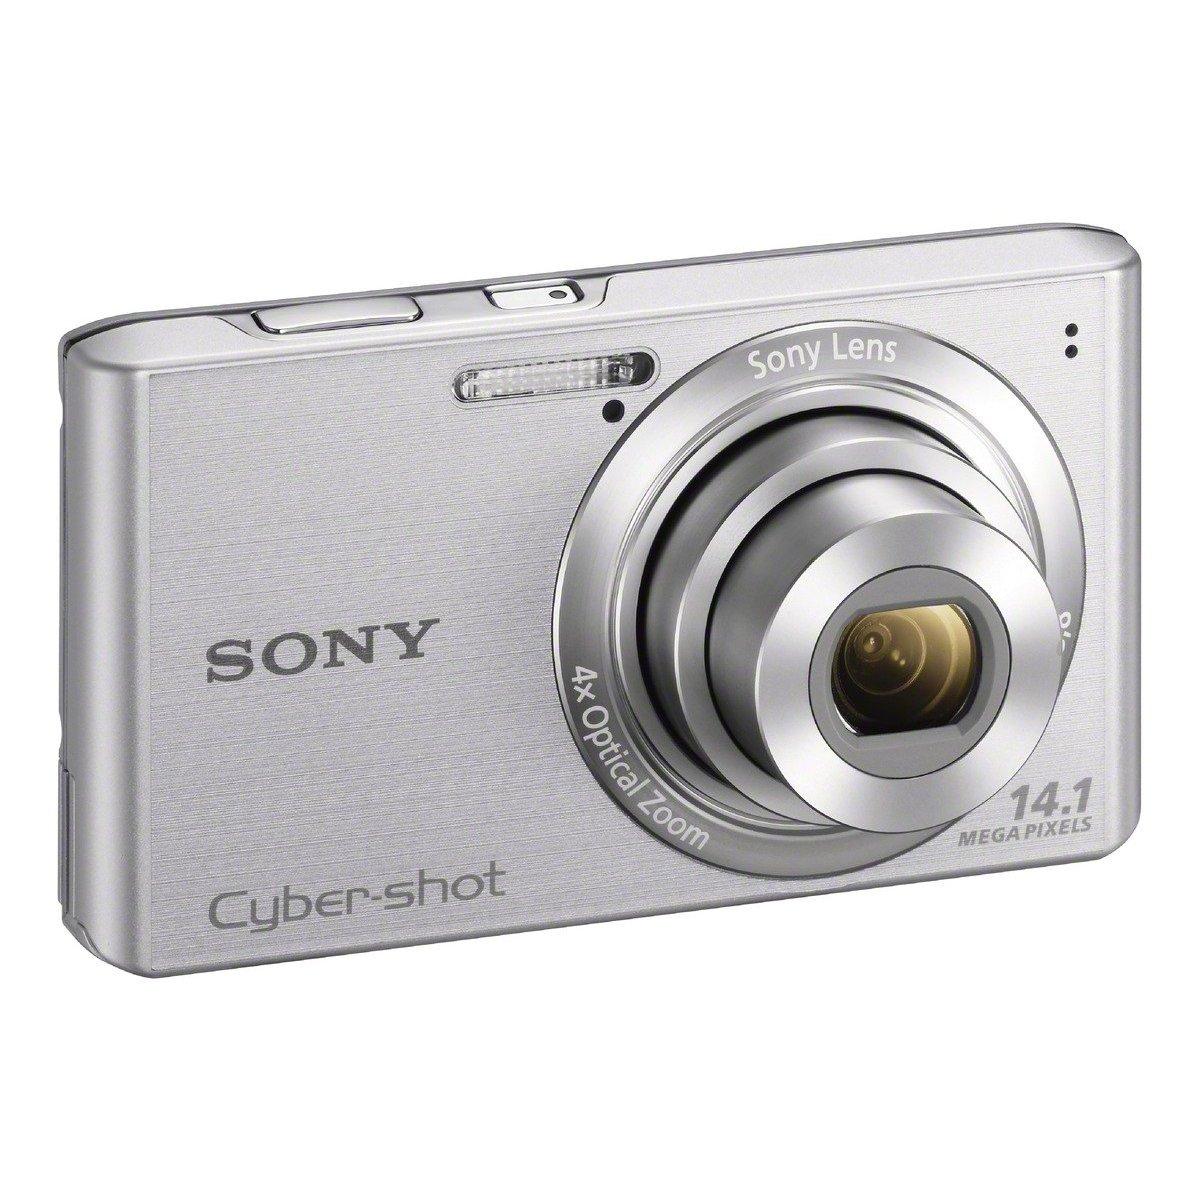 https://thetechjournal.com/wp-content/uploads/images/1201/1326861340-sony-cybershot-dscw610-141-mp-digital-camera-4.jpg